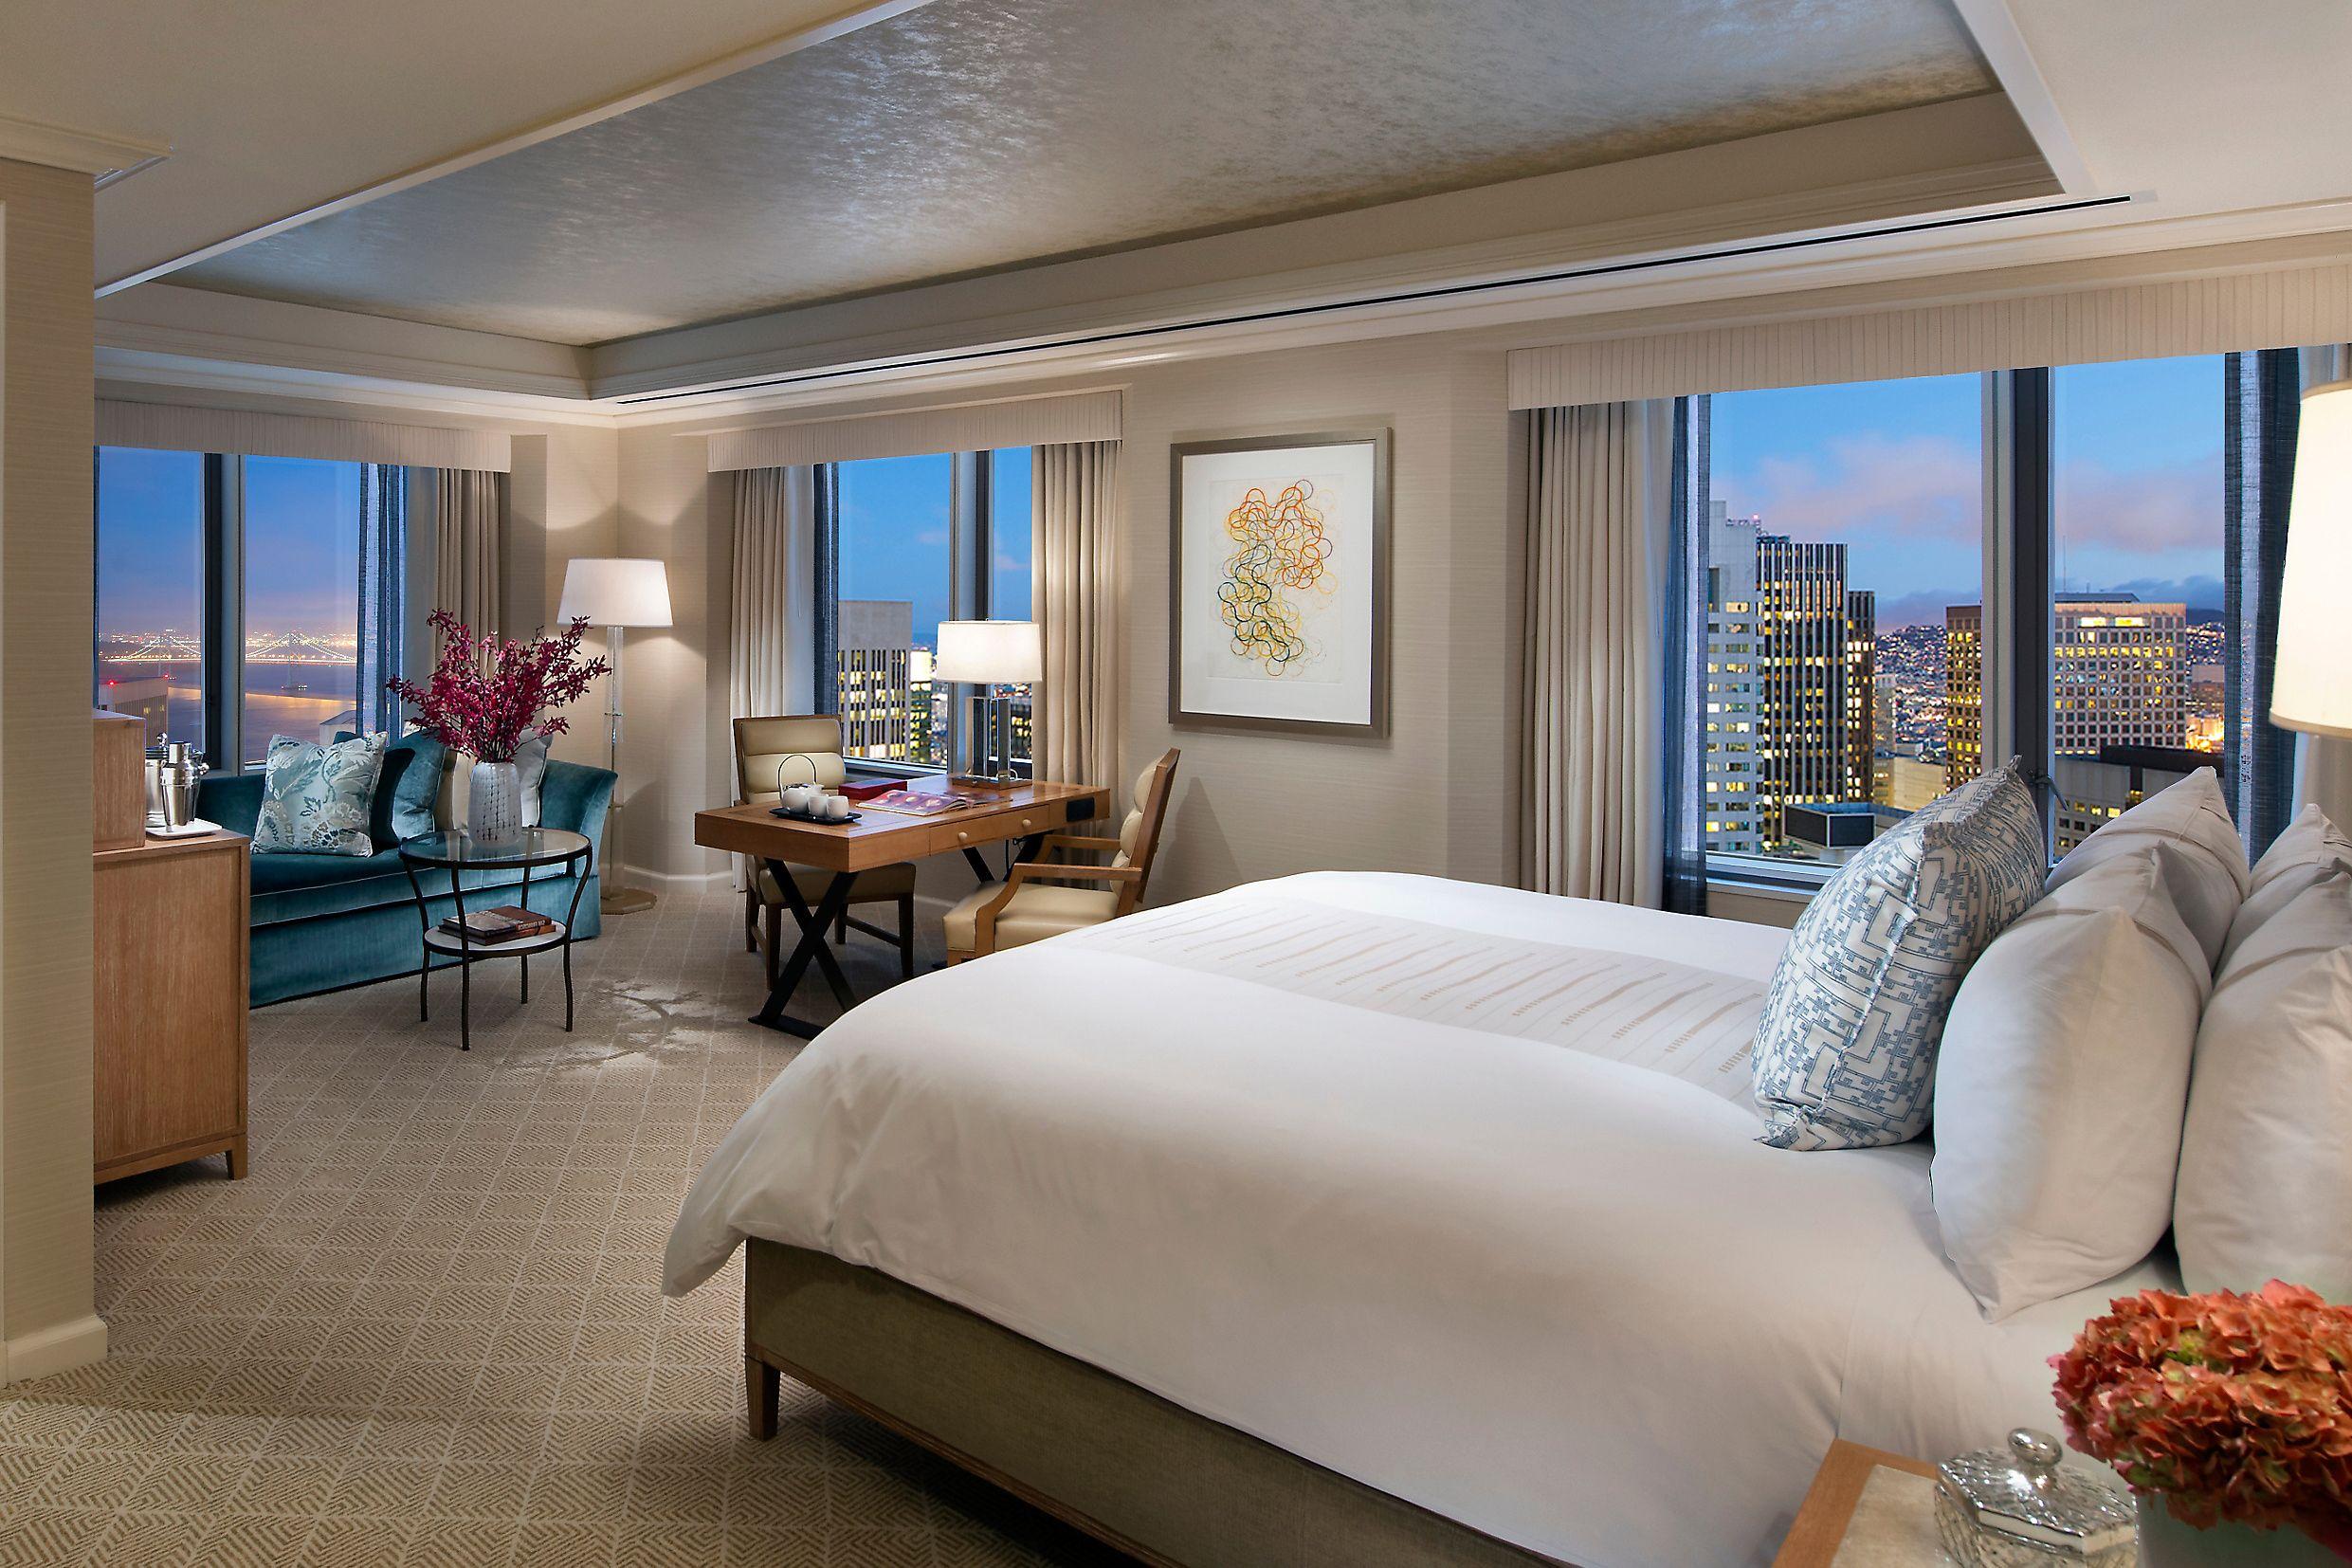 Mandarin Oriental San Francisco (With images) Luxury